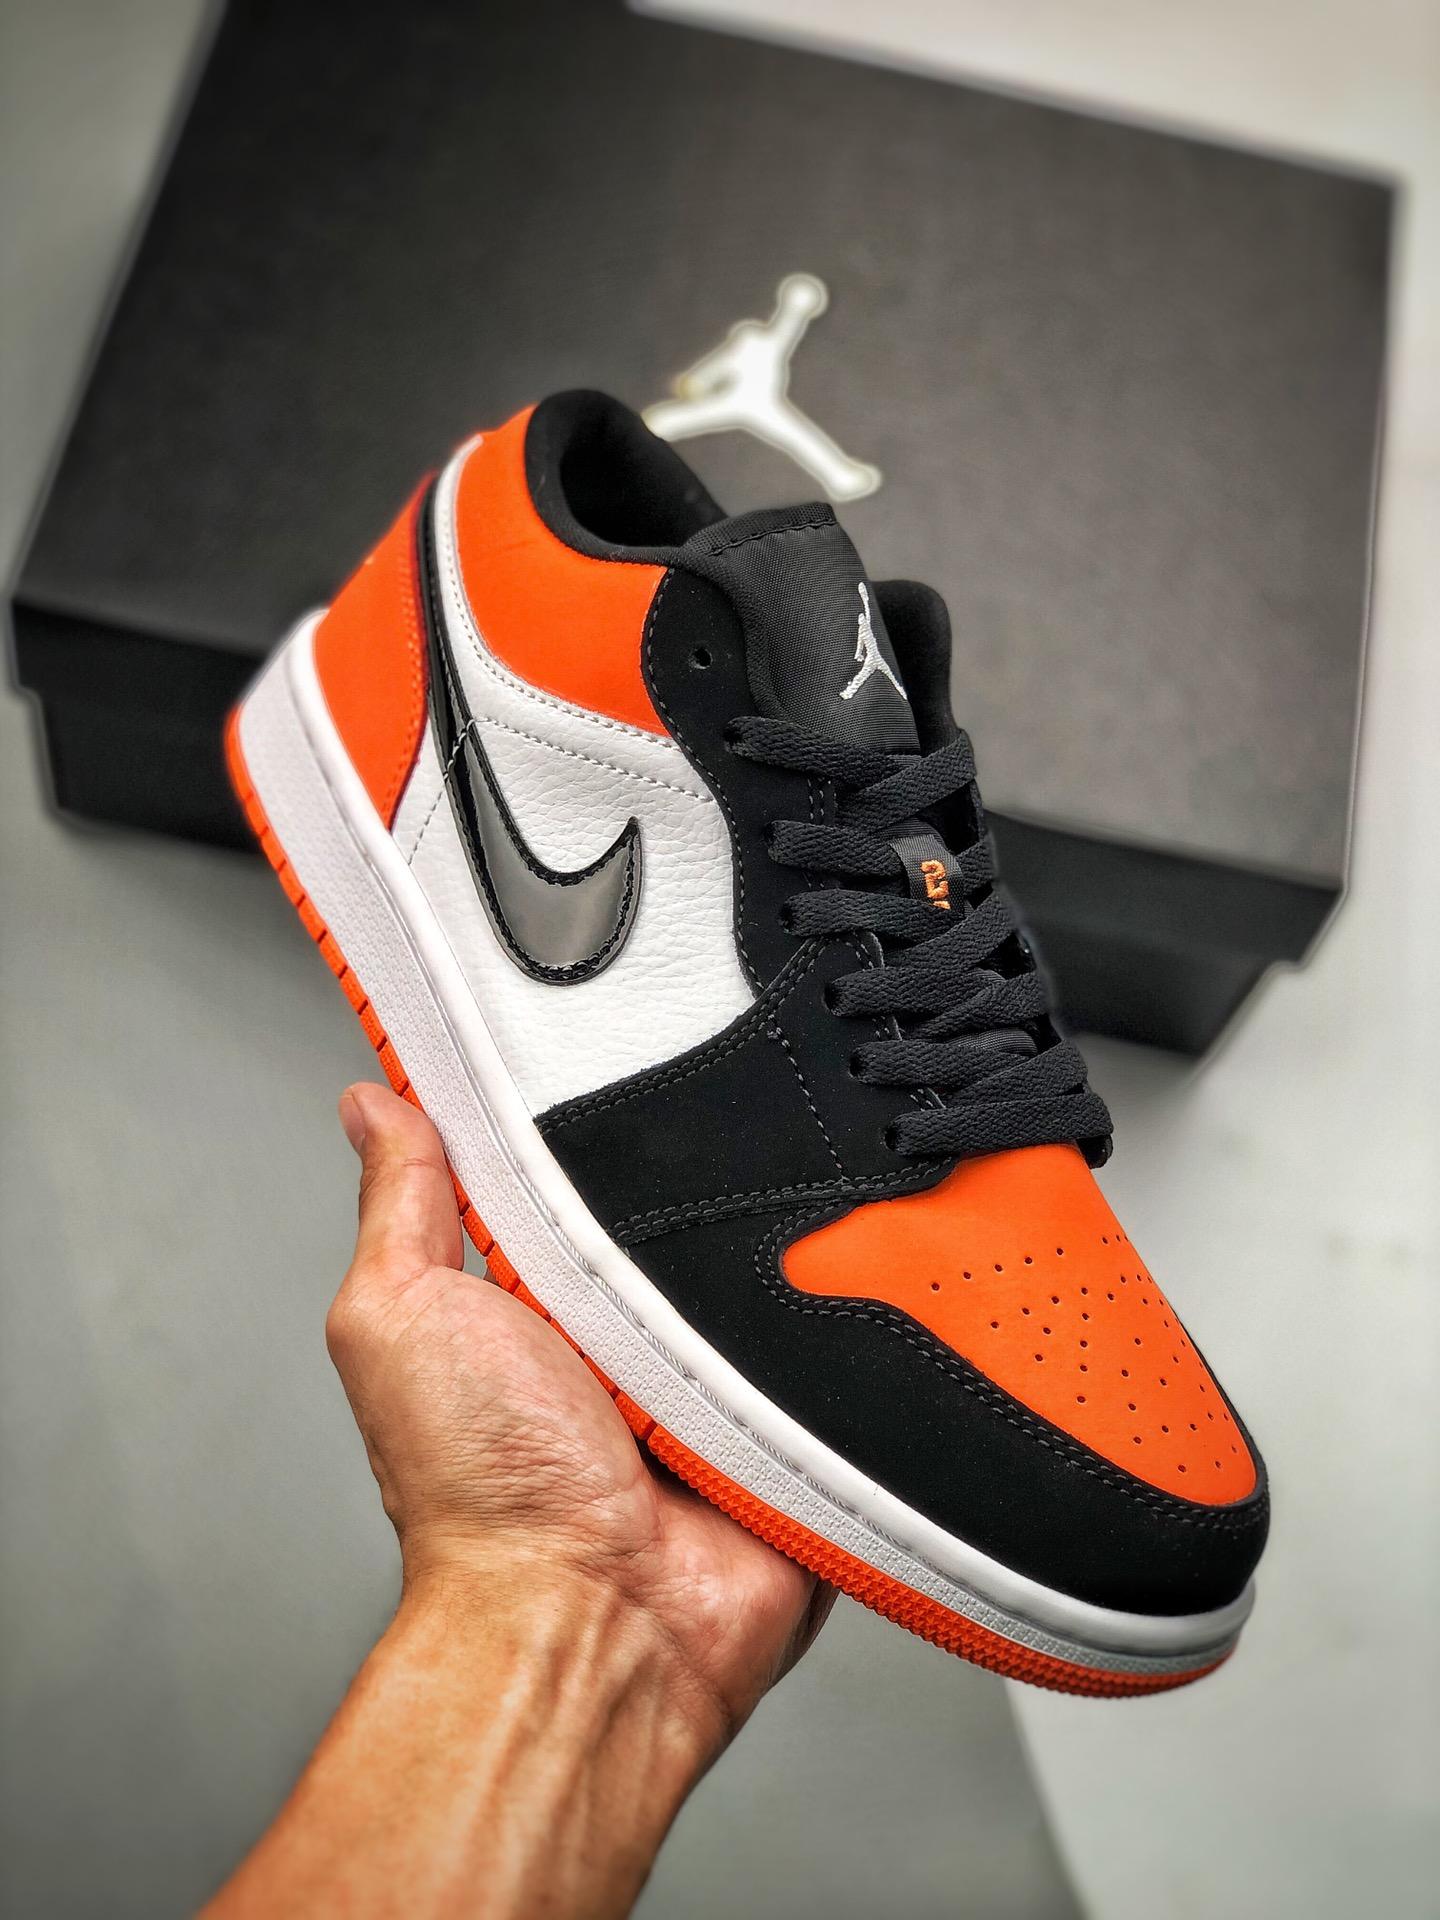 S2低帮low系列 Air Jordan 1 Low 黑橙扣碎 货号:553558-128 扣碎 黑白橙色_s2纯原微